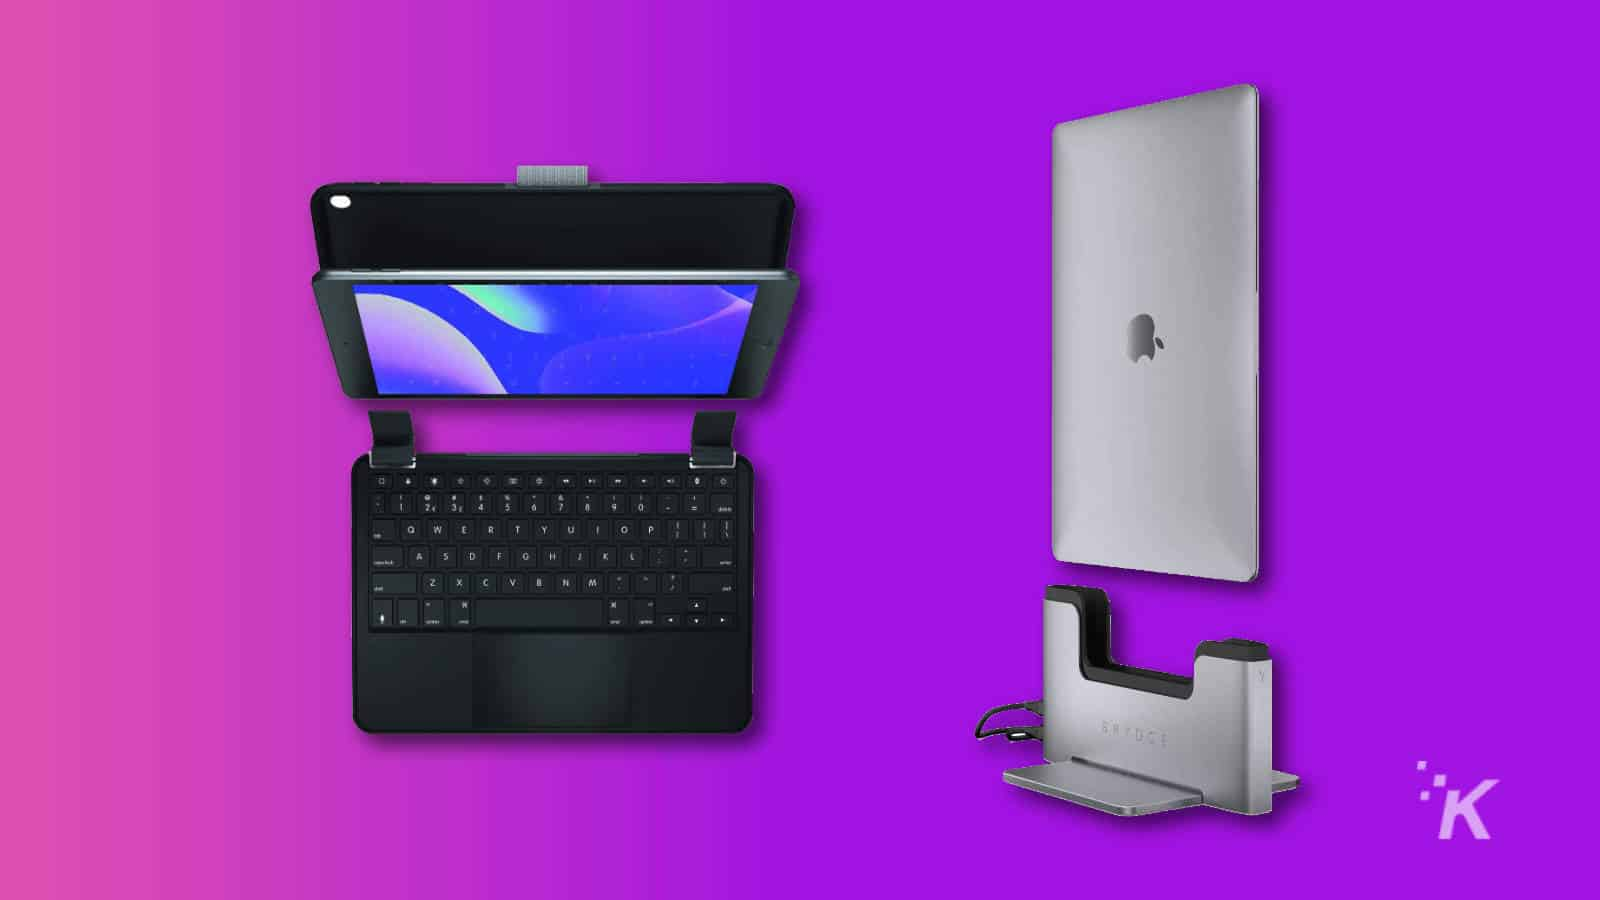 brydge dock for macbook and ipad keyboard